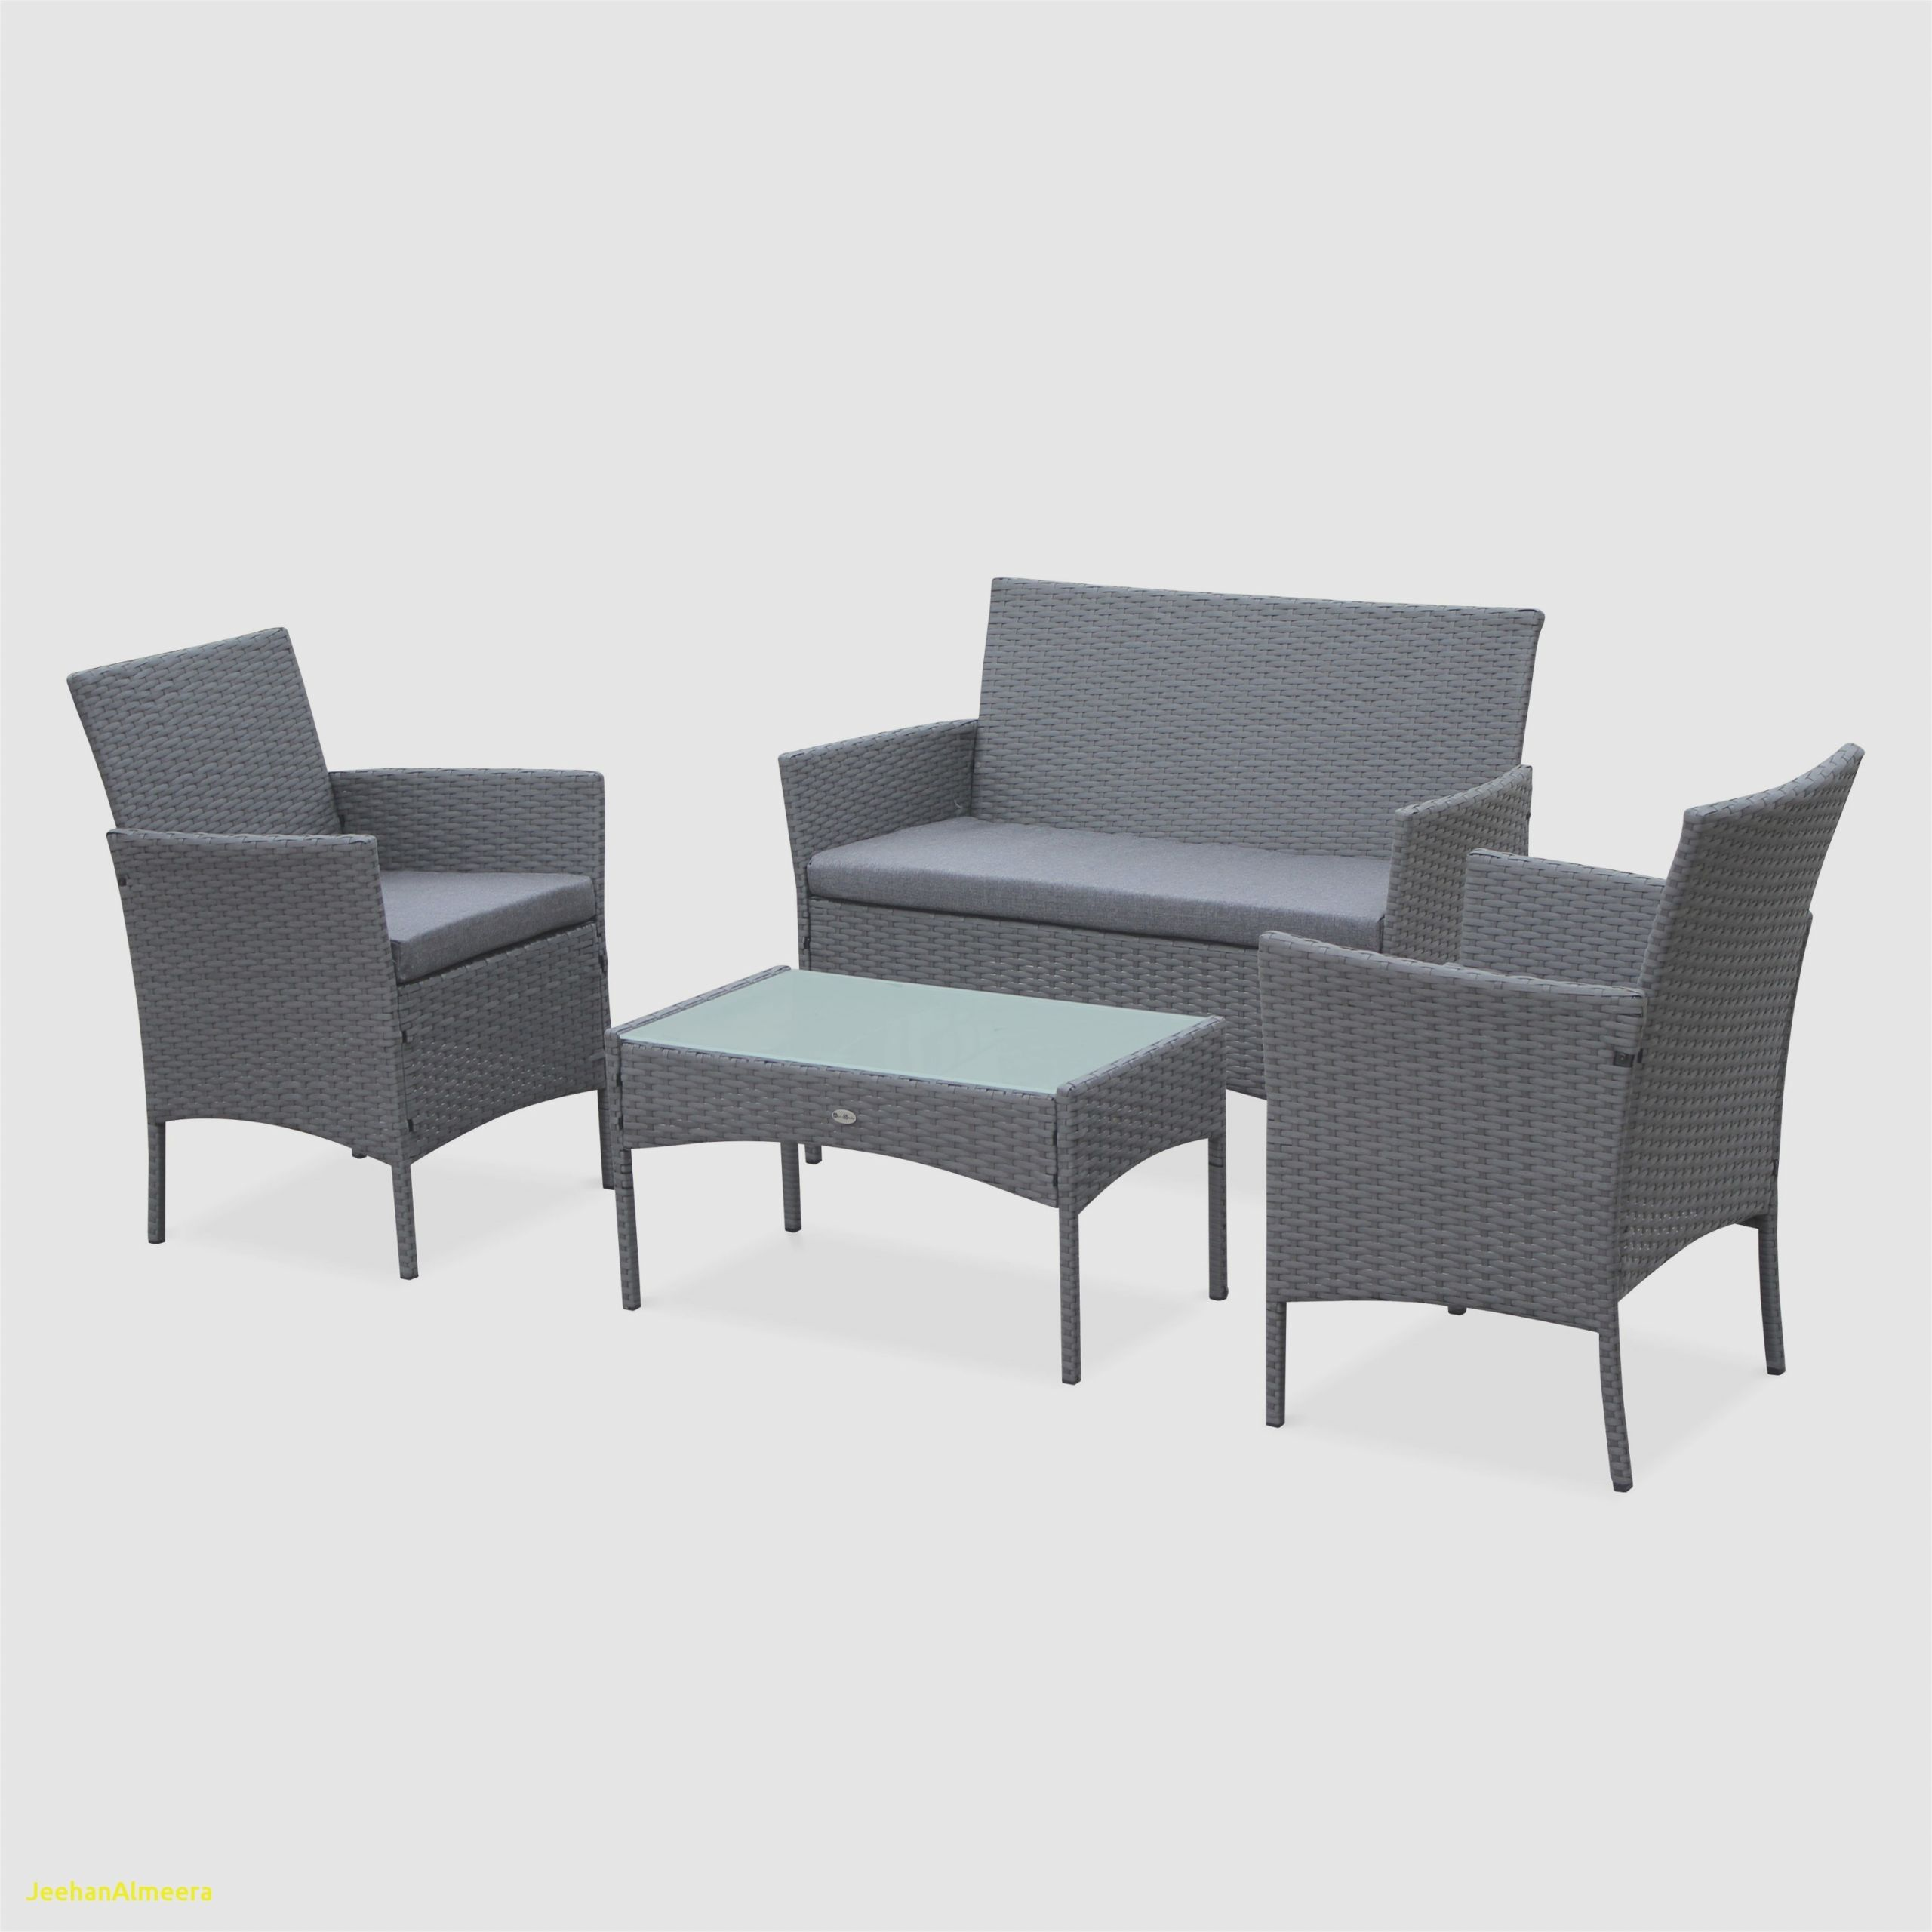 Salon De Jardin Caligari Génial Best Table De Jardin Aluminium Auchan House